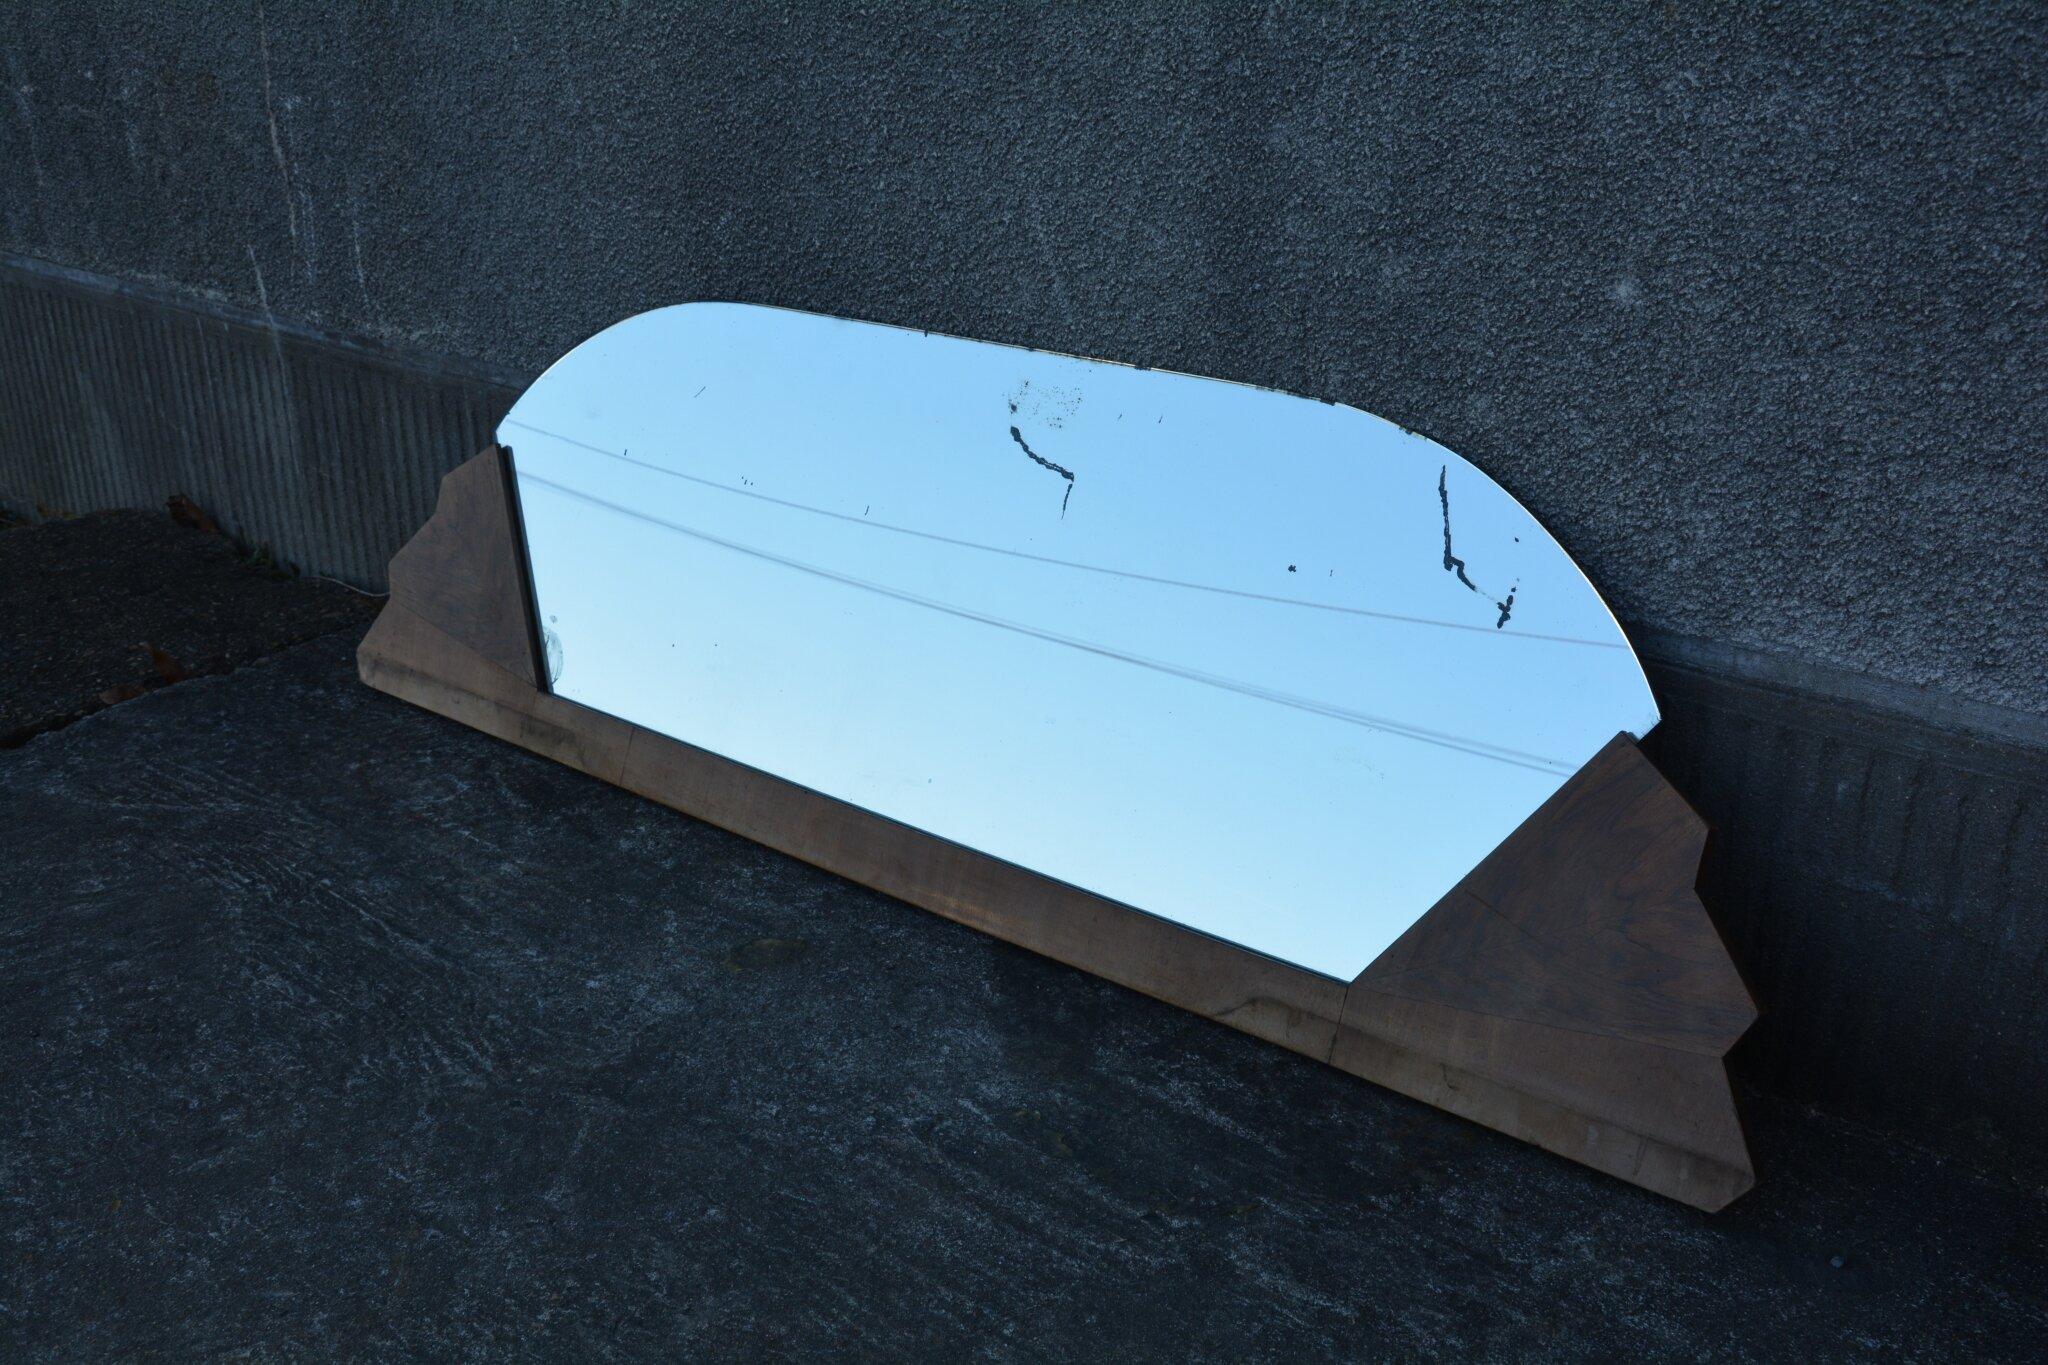 miroir art d co la petite brocanteuse. Black Bedroom Furniture Sets. Home Design Ideas